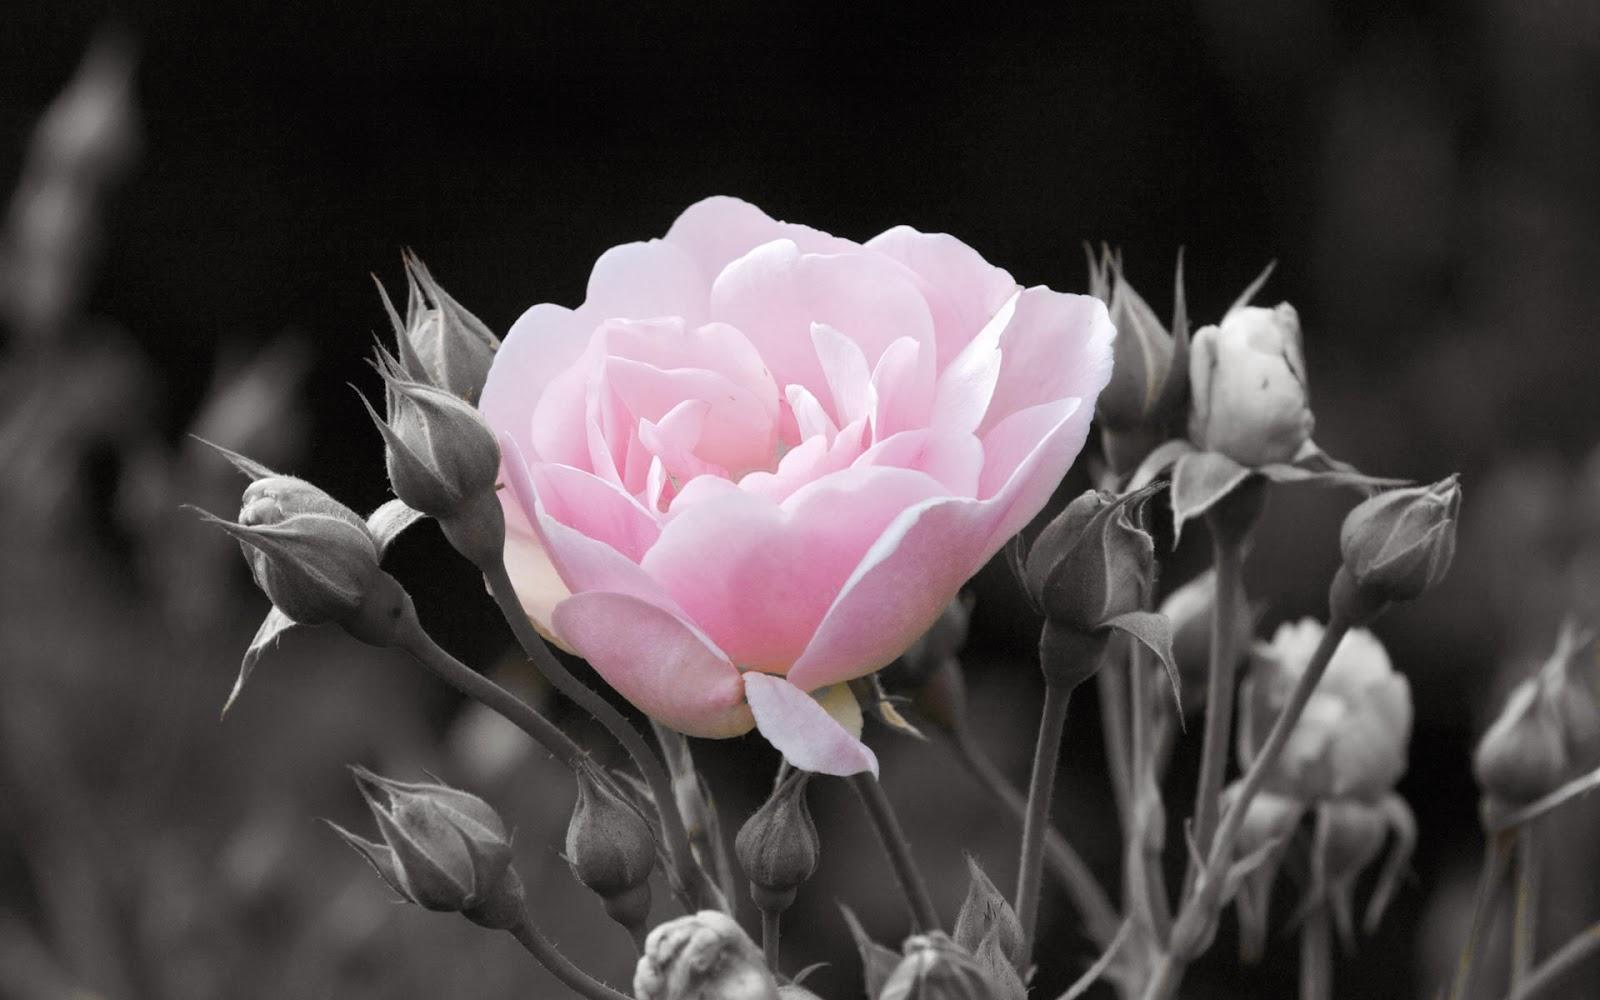 Menciptakan Color Splash atau selektive Color dengan Photoshop ~ Sidimageenation